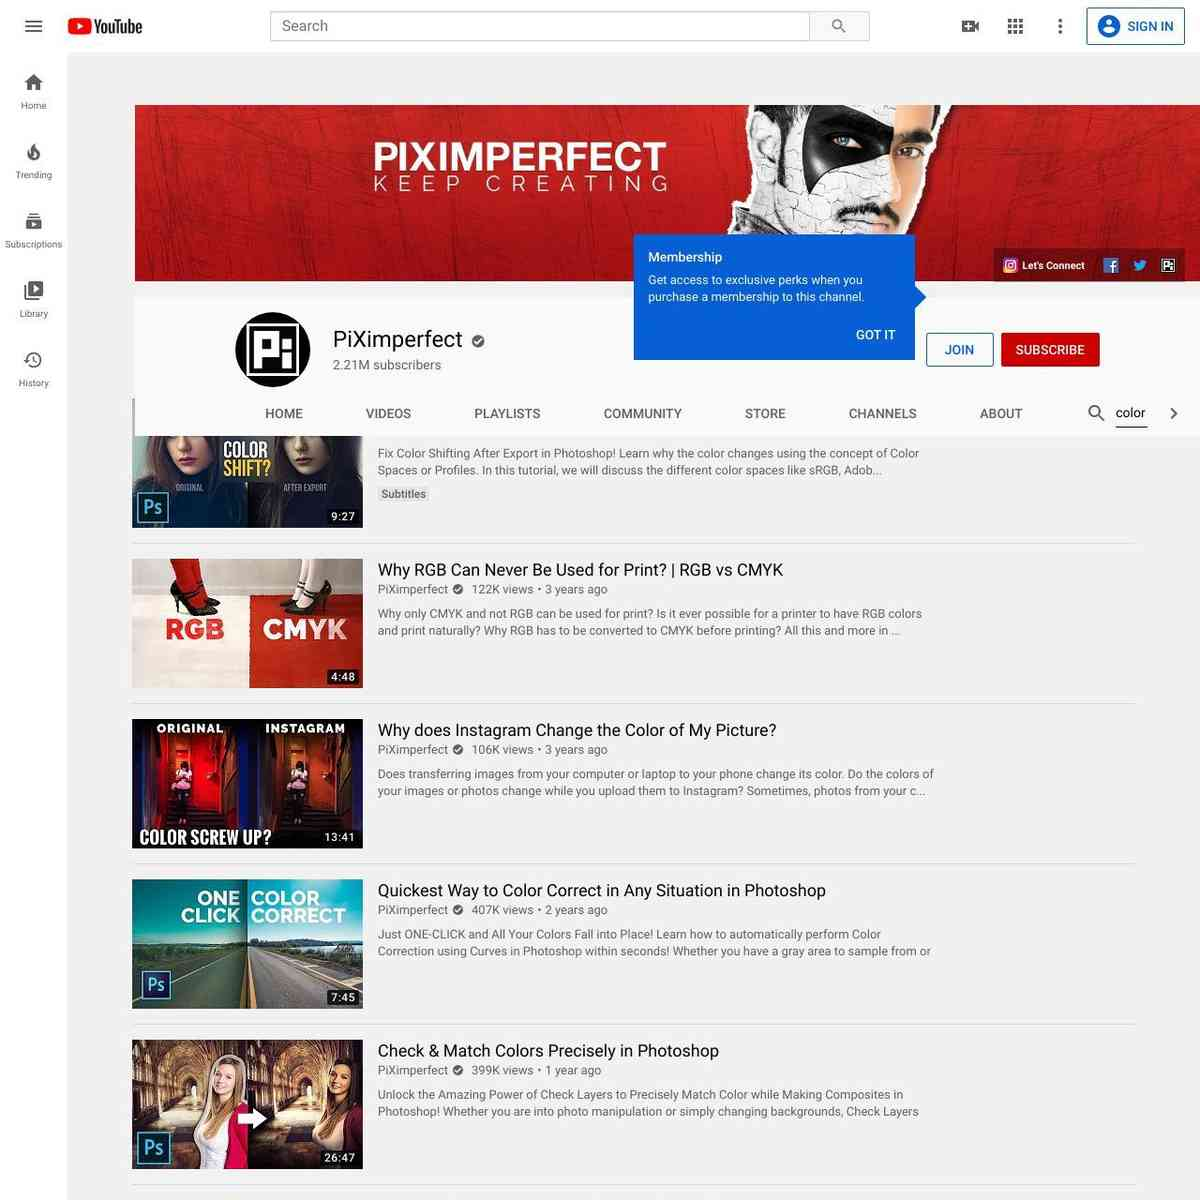 PiXimperfect - YouTube